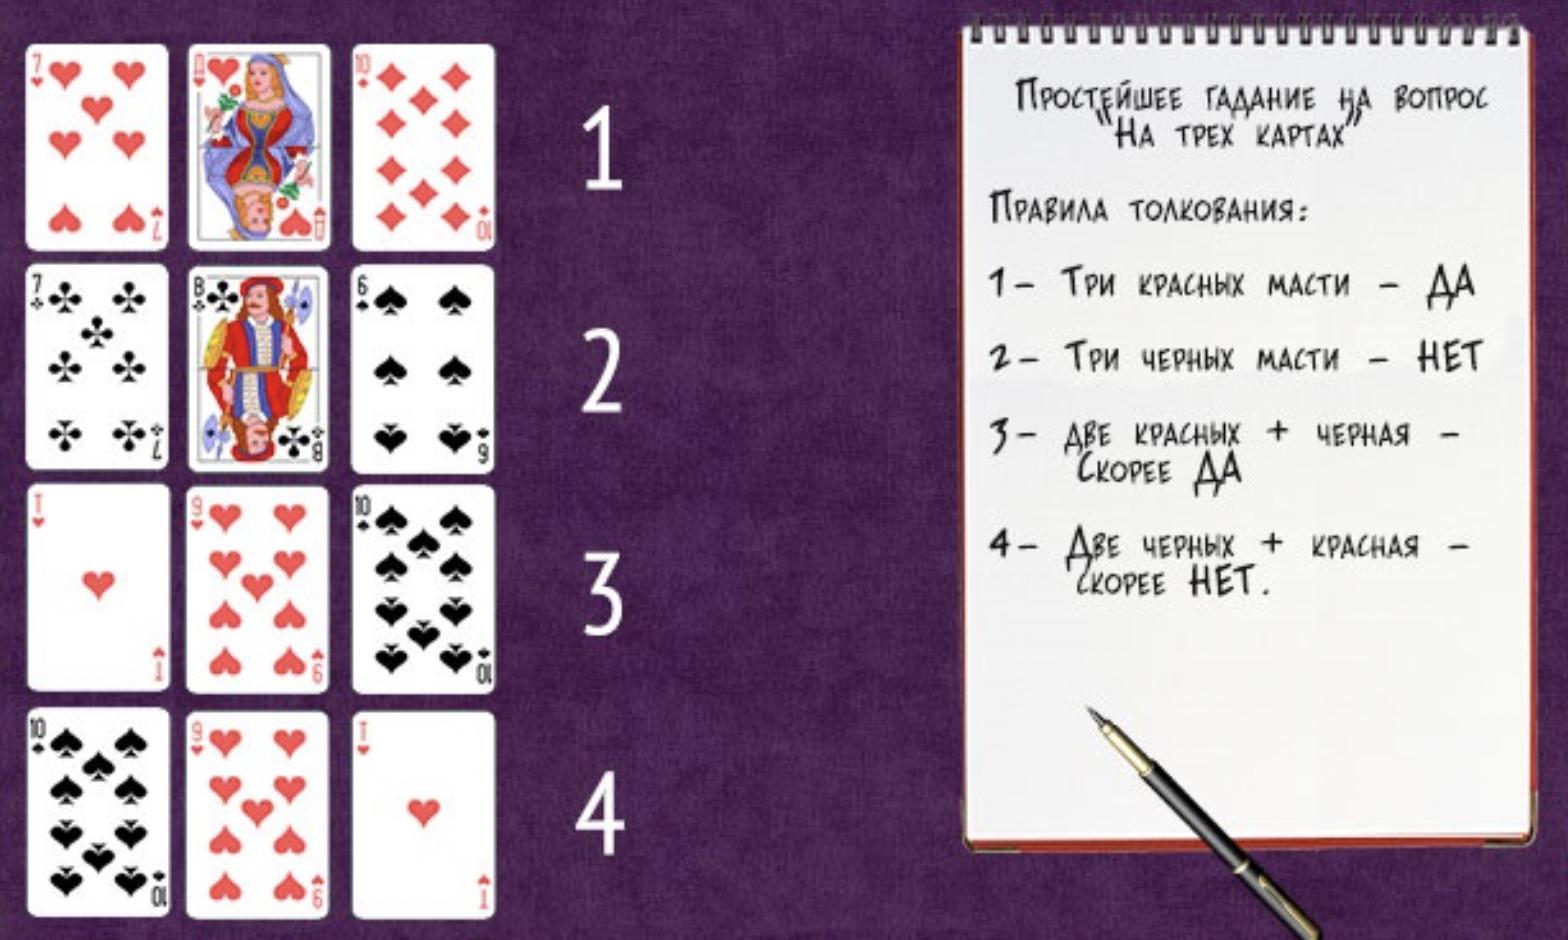 Гадание на жениха на простых картах расклад гадания на 13 карт